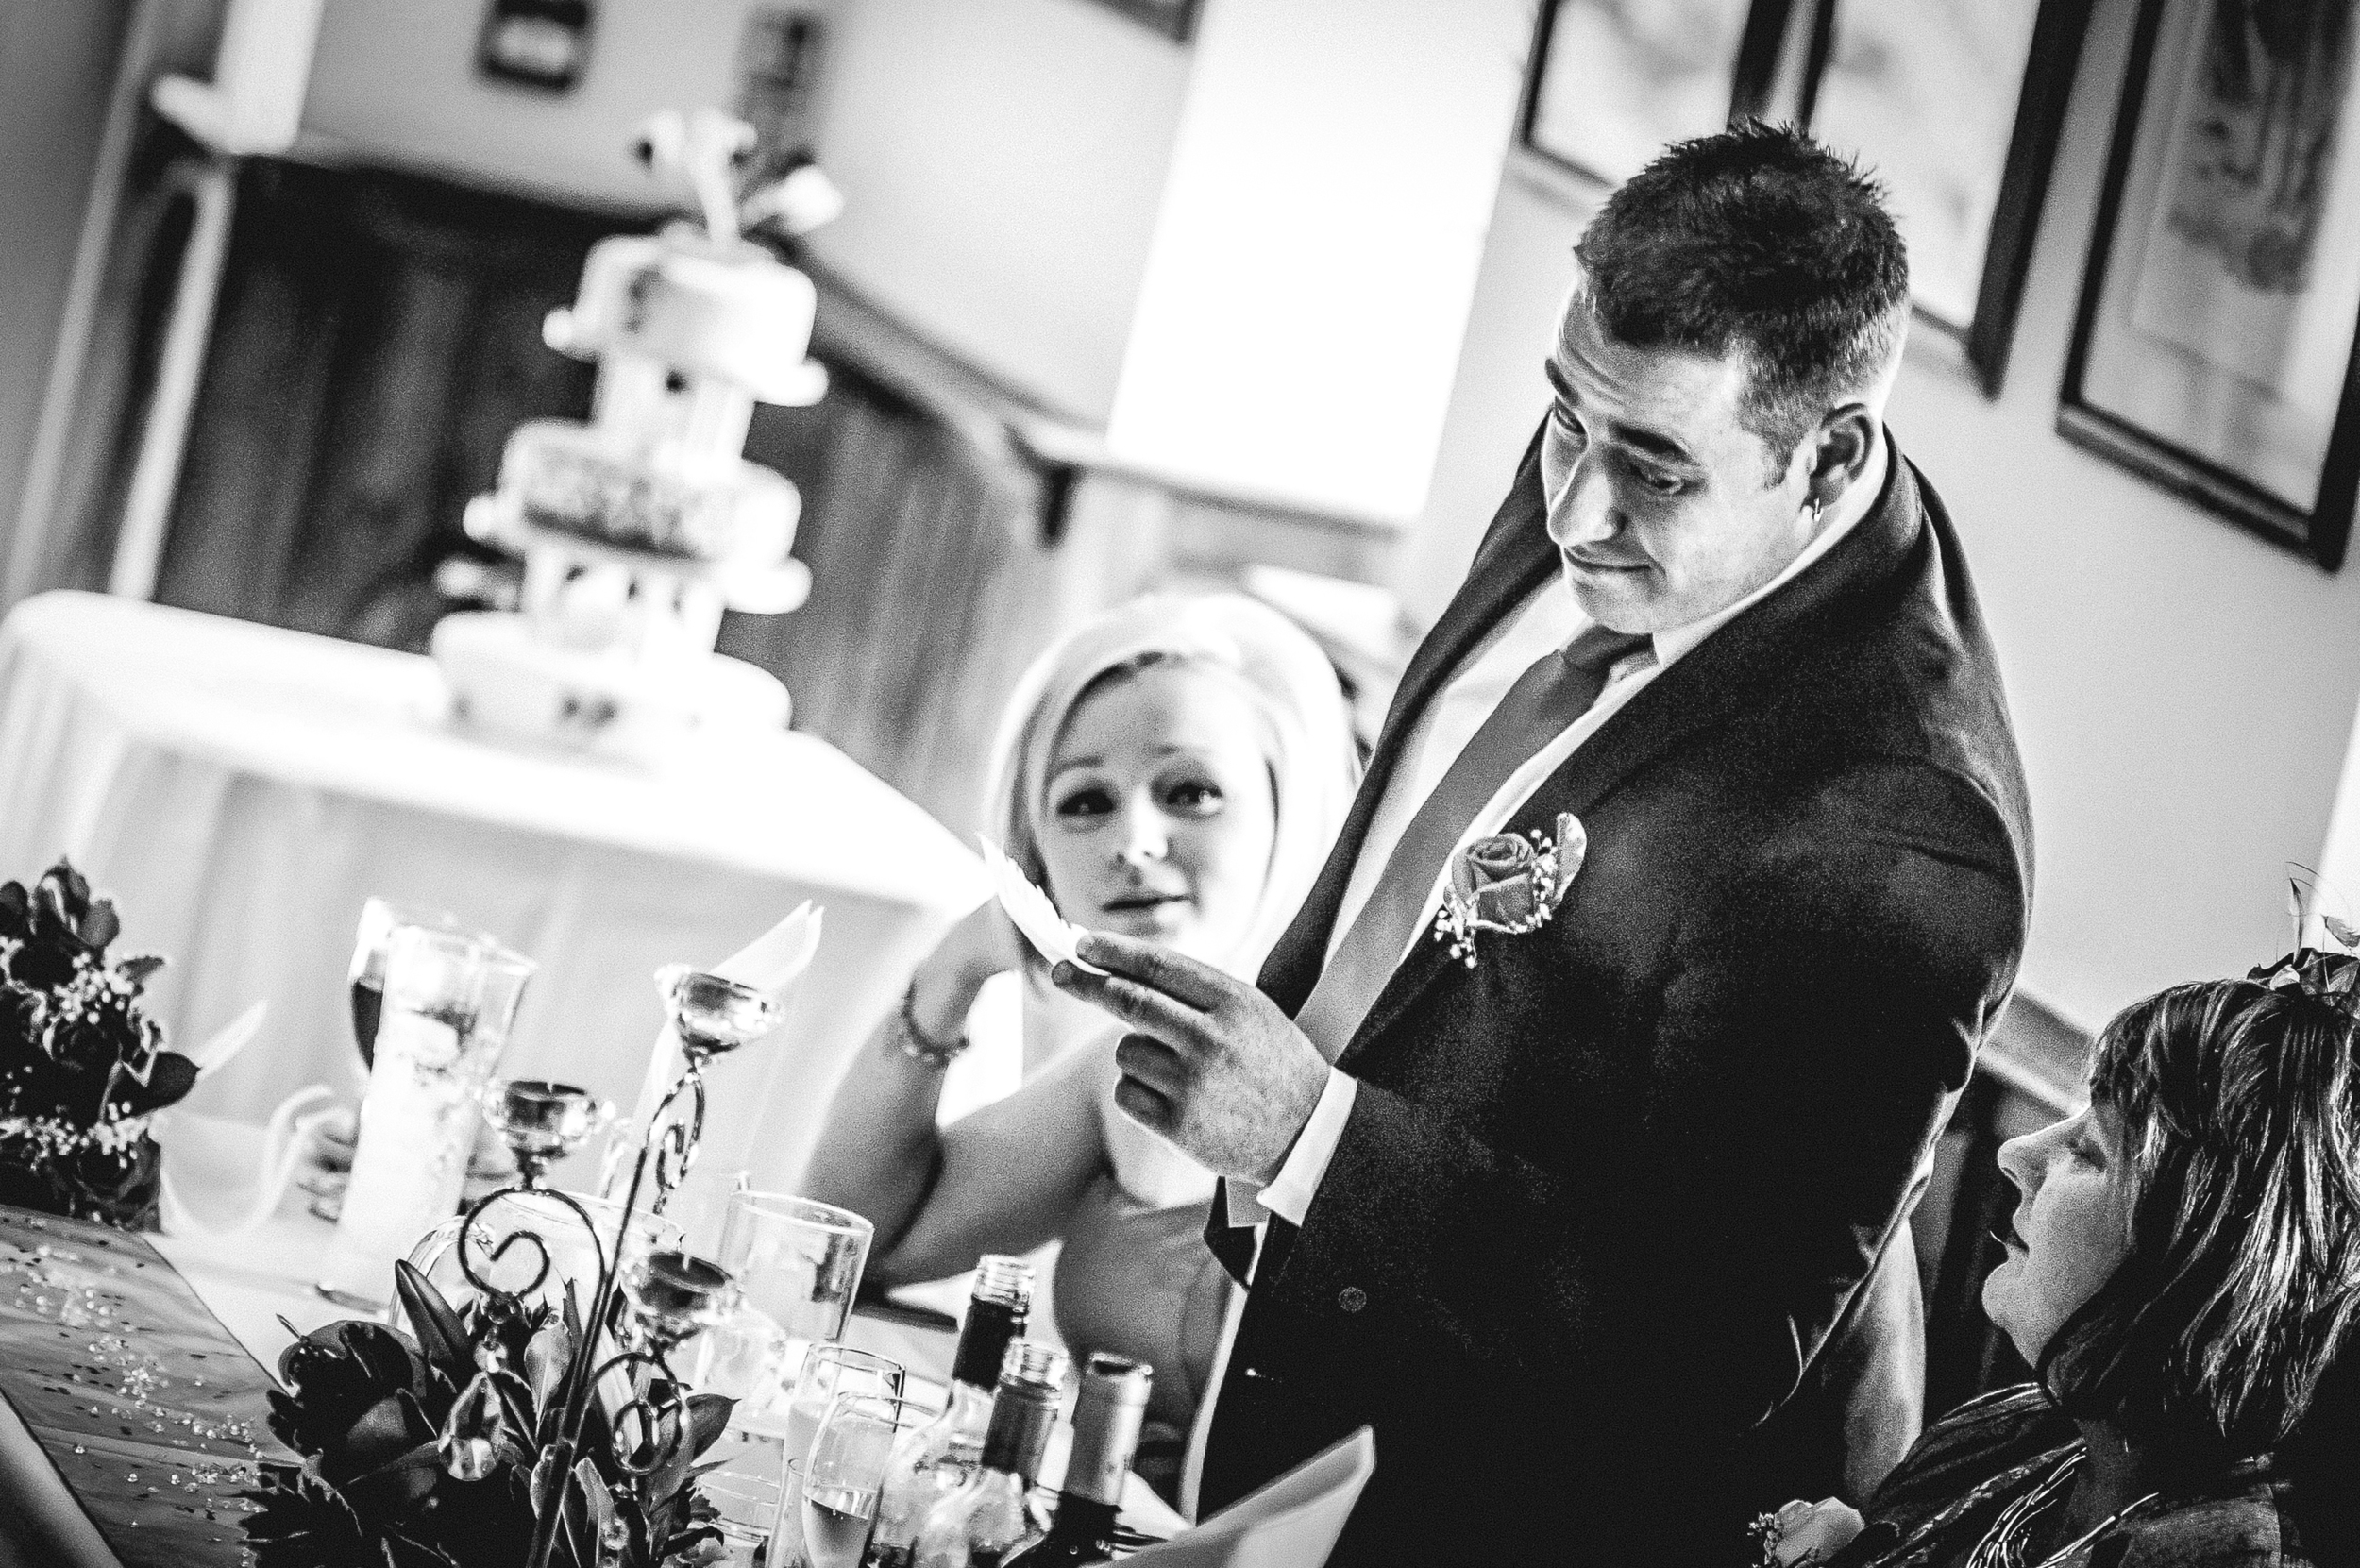 My first wedding.  Nikon D300 | 135mm | F2.8 - 1/160th - iso1000